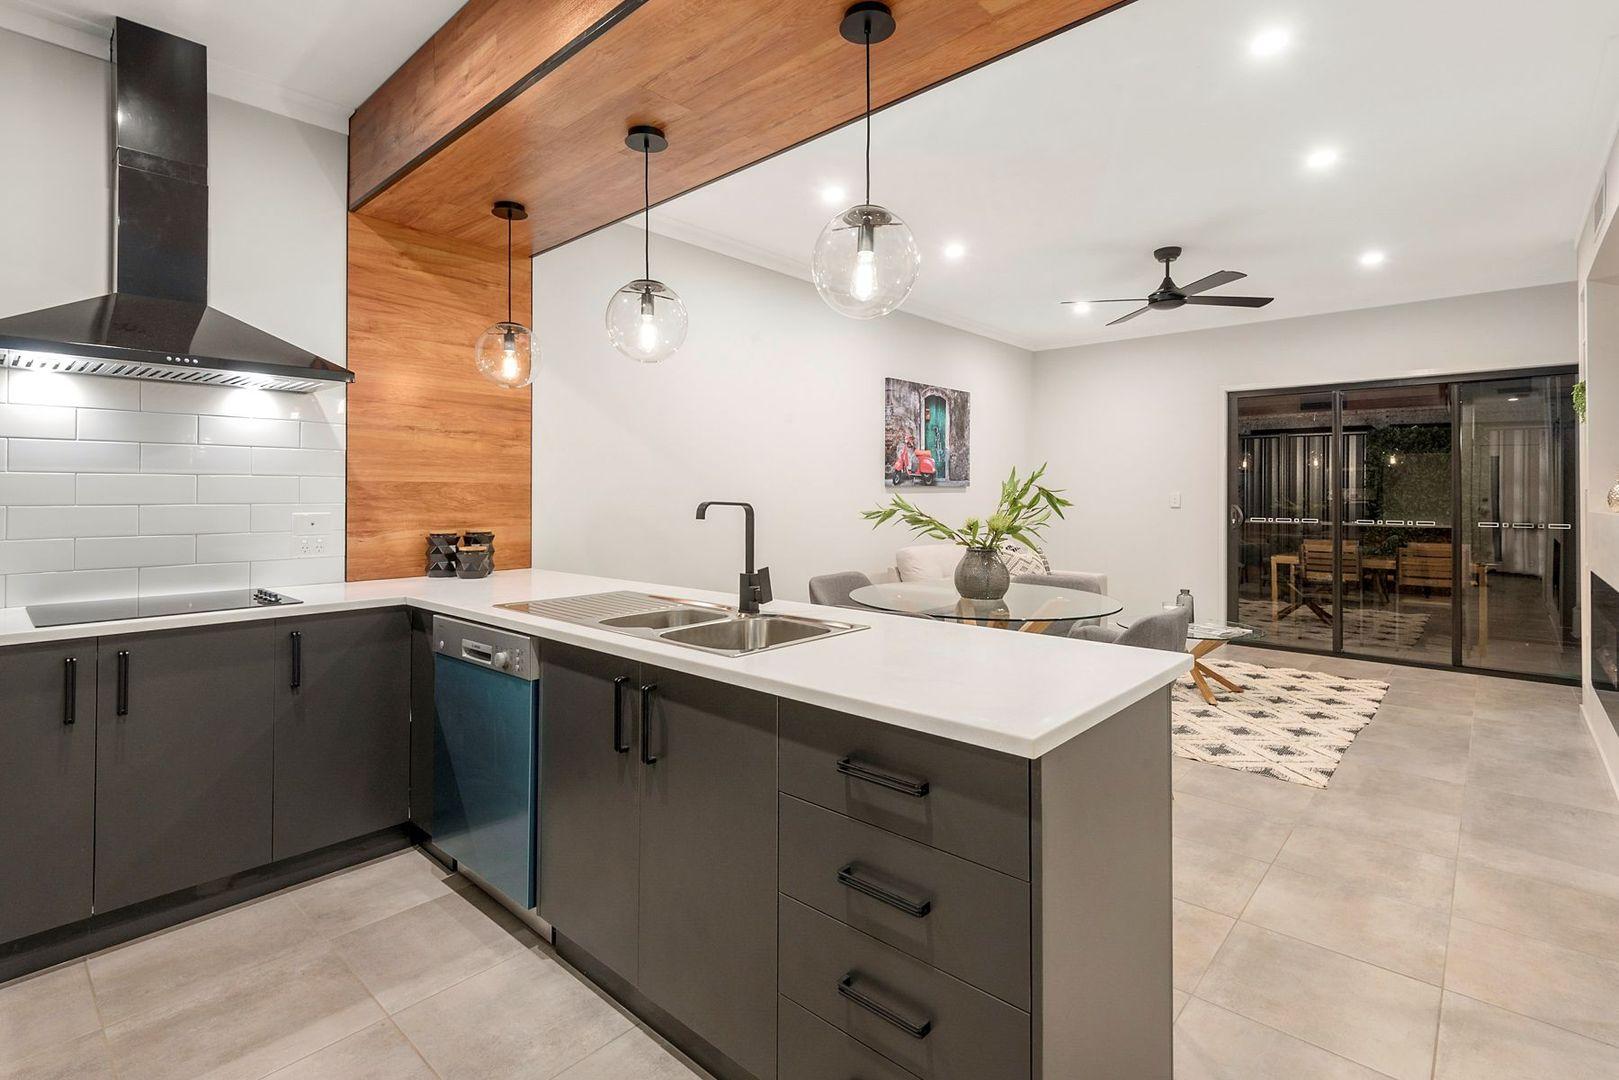 5/231 Bridge Street, North Toowoomba QLD 4350, Image 0